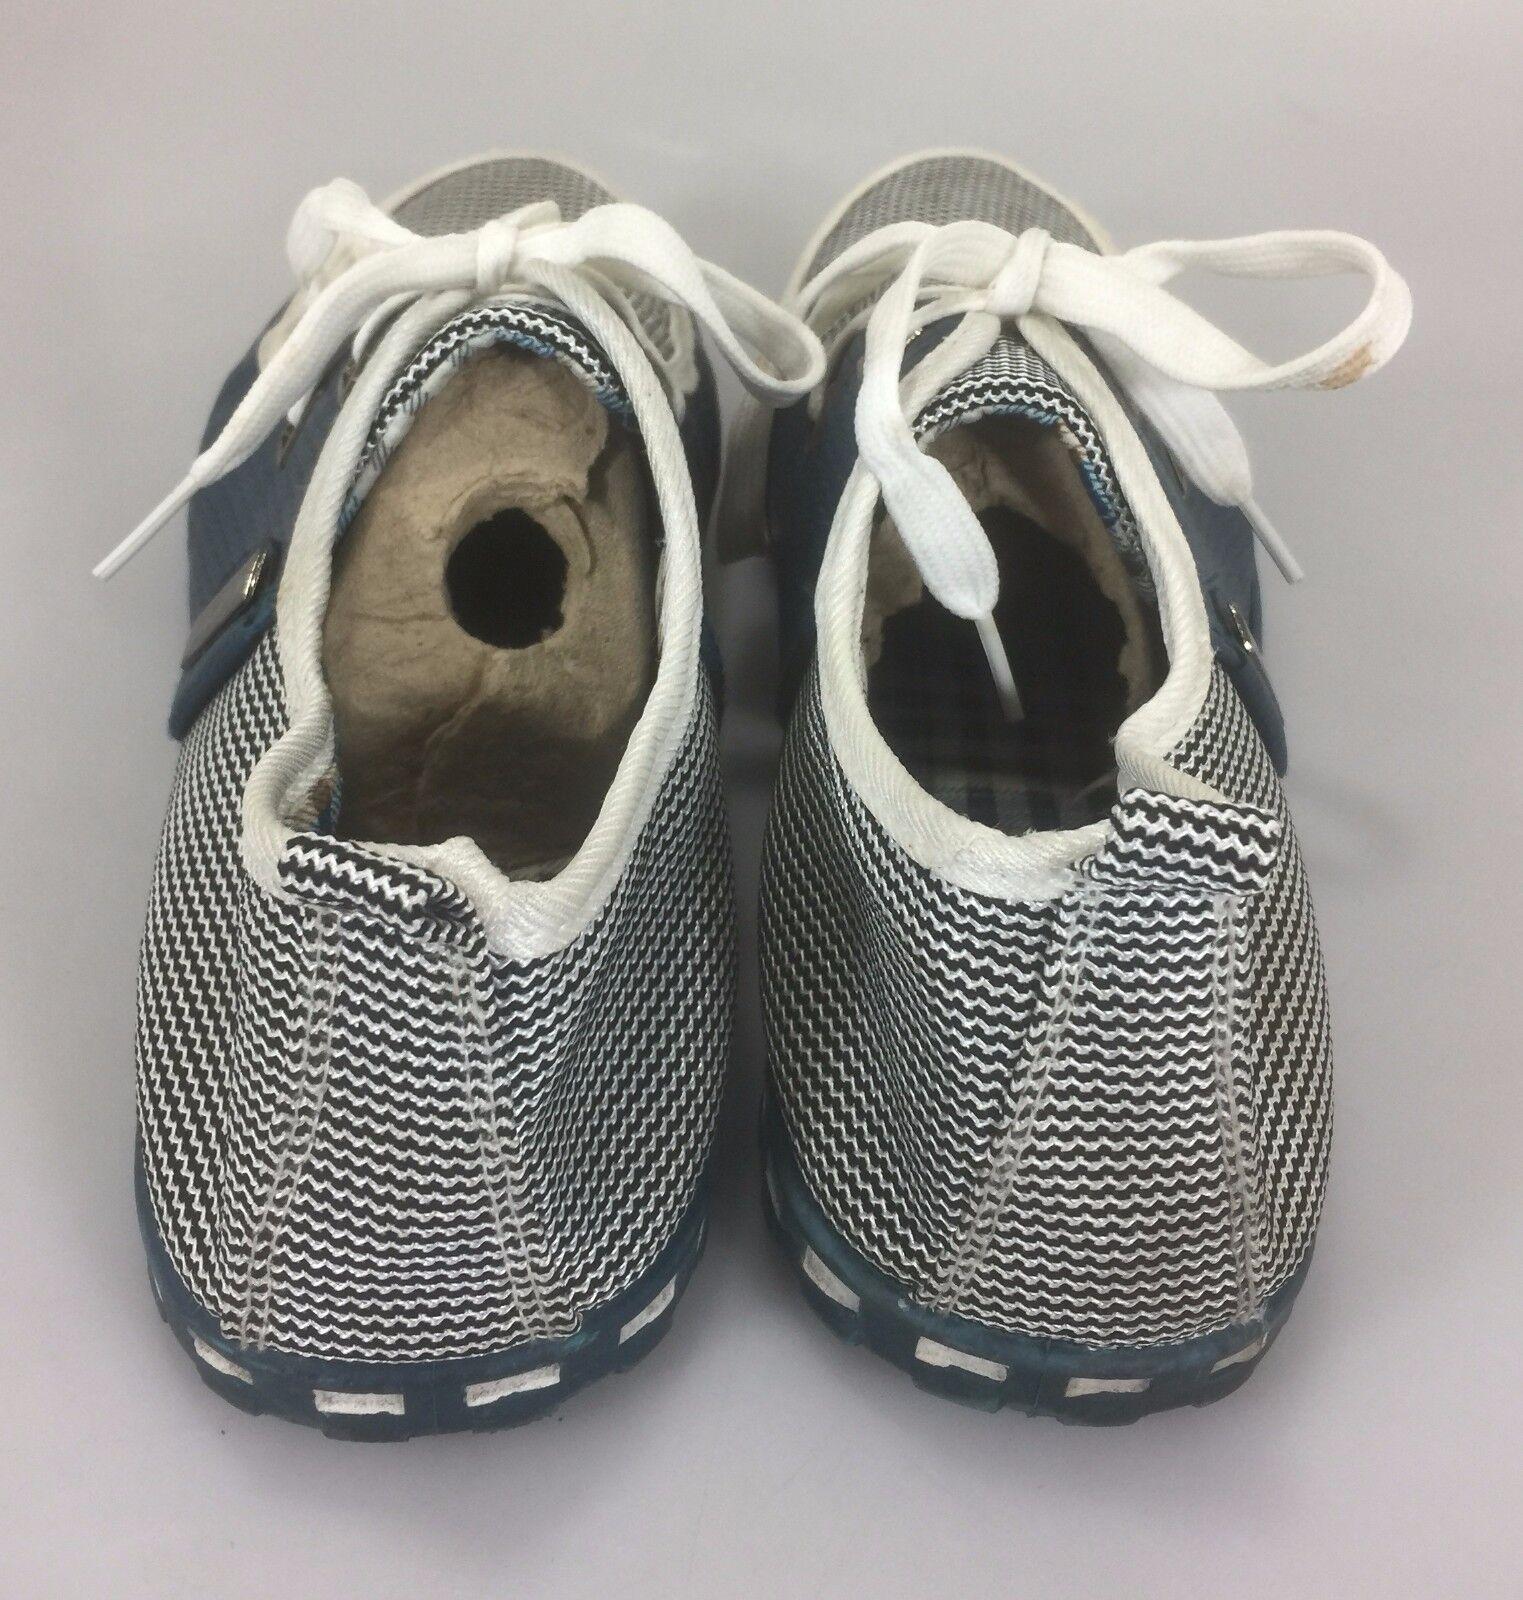 Shoens scarpe le 12 uomini blu bianco controlla le scarpe scarpe da ginnastica 46 ue c91561